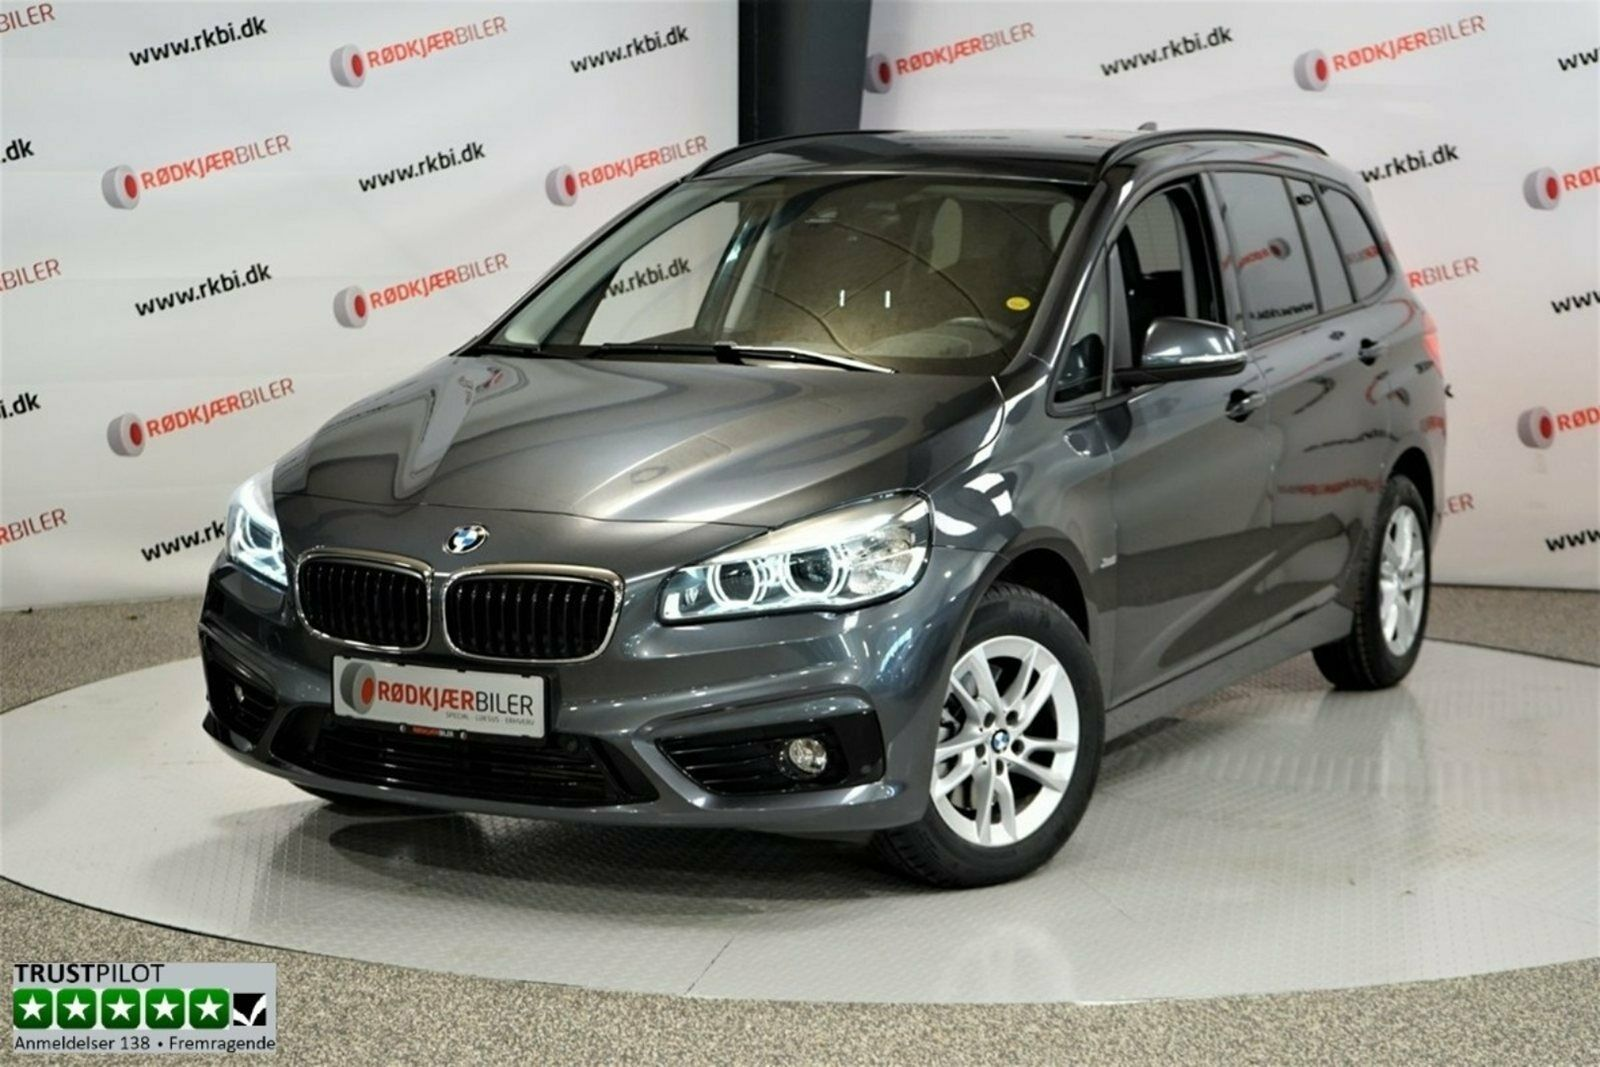 BMW 218i 1,5 Gran Tourer Sport Line aut. 7p 5d - 359.900 kr.